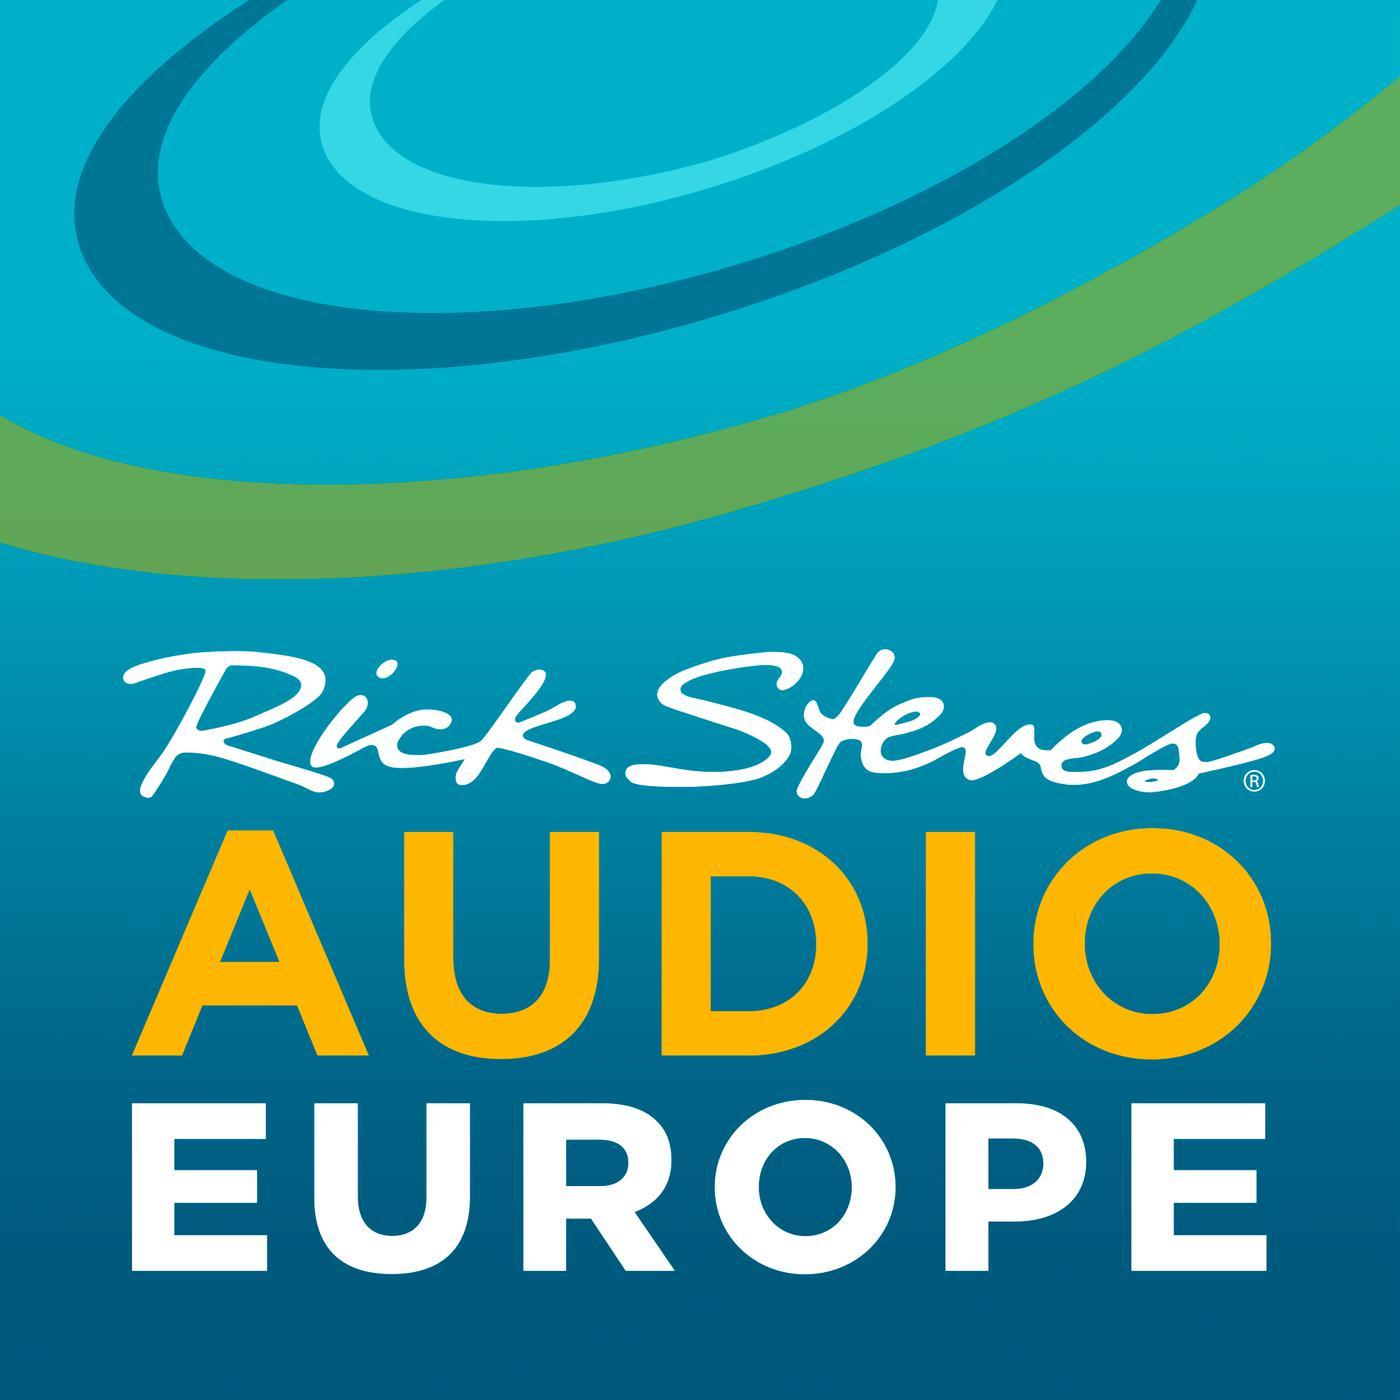 Robert Wright, Rick Steves, audio Europe, radio interview